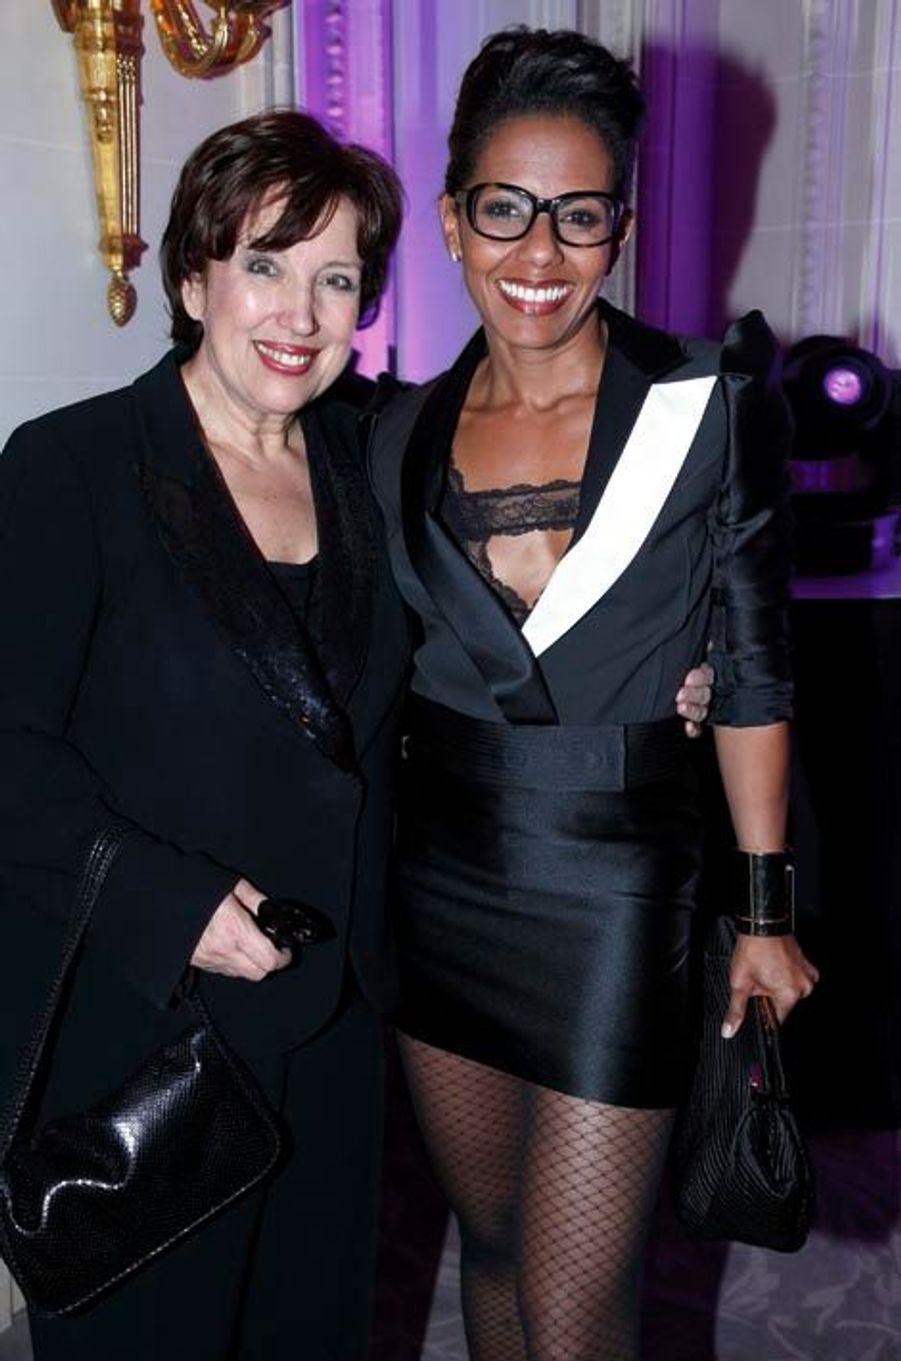 Roselyne Bachelot et Audrey Pulvar, adepte des minis sexy !